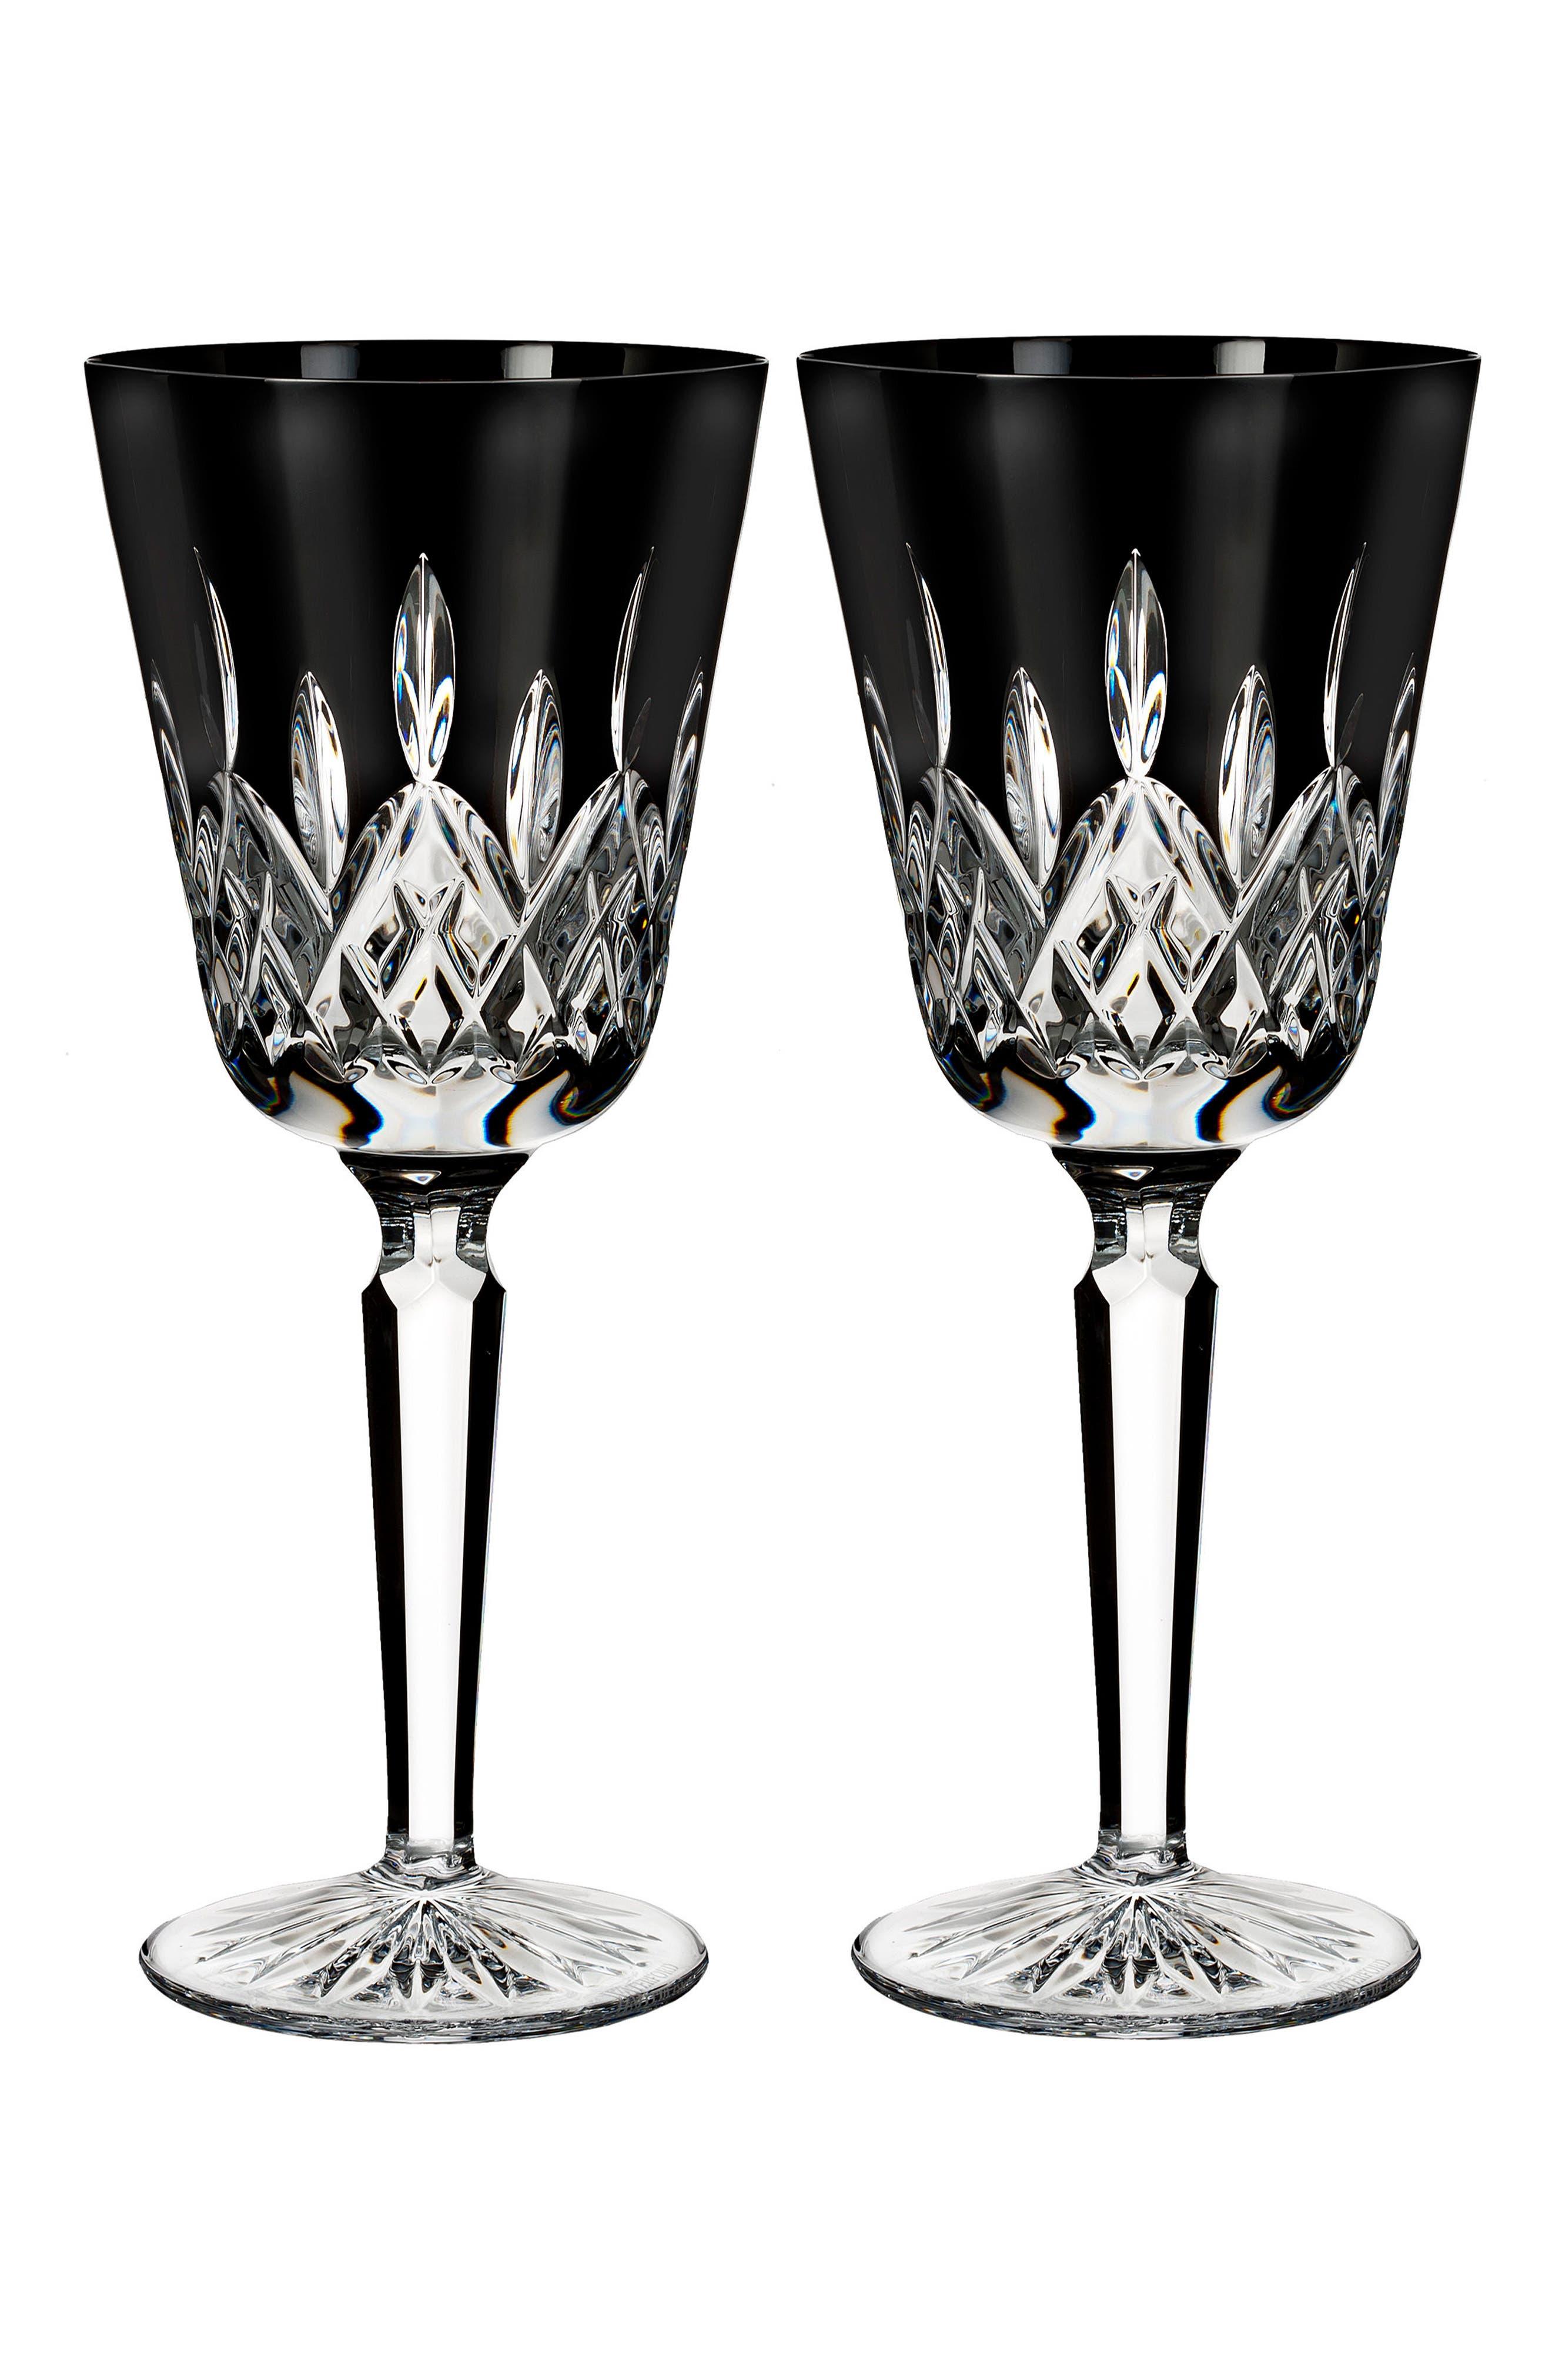 Lismore Diamond Set of 2 Black Lead Crystal Goblets,                             Main thumbnail 1, color,                             Crystal